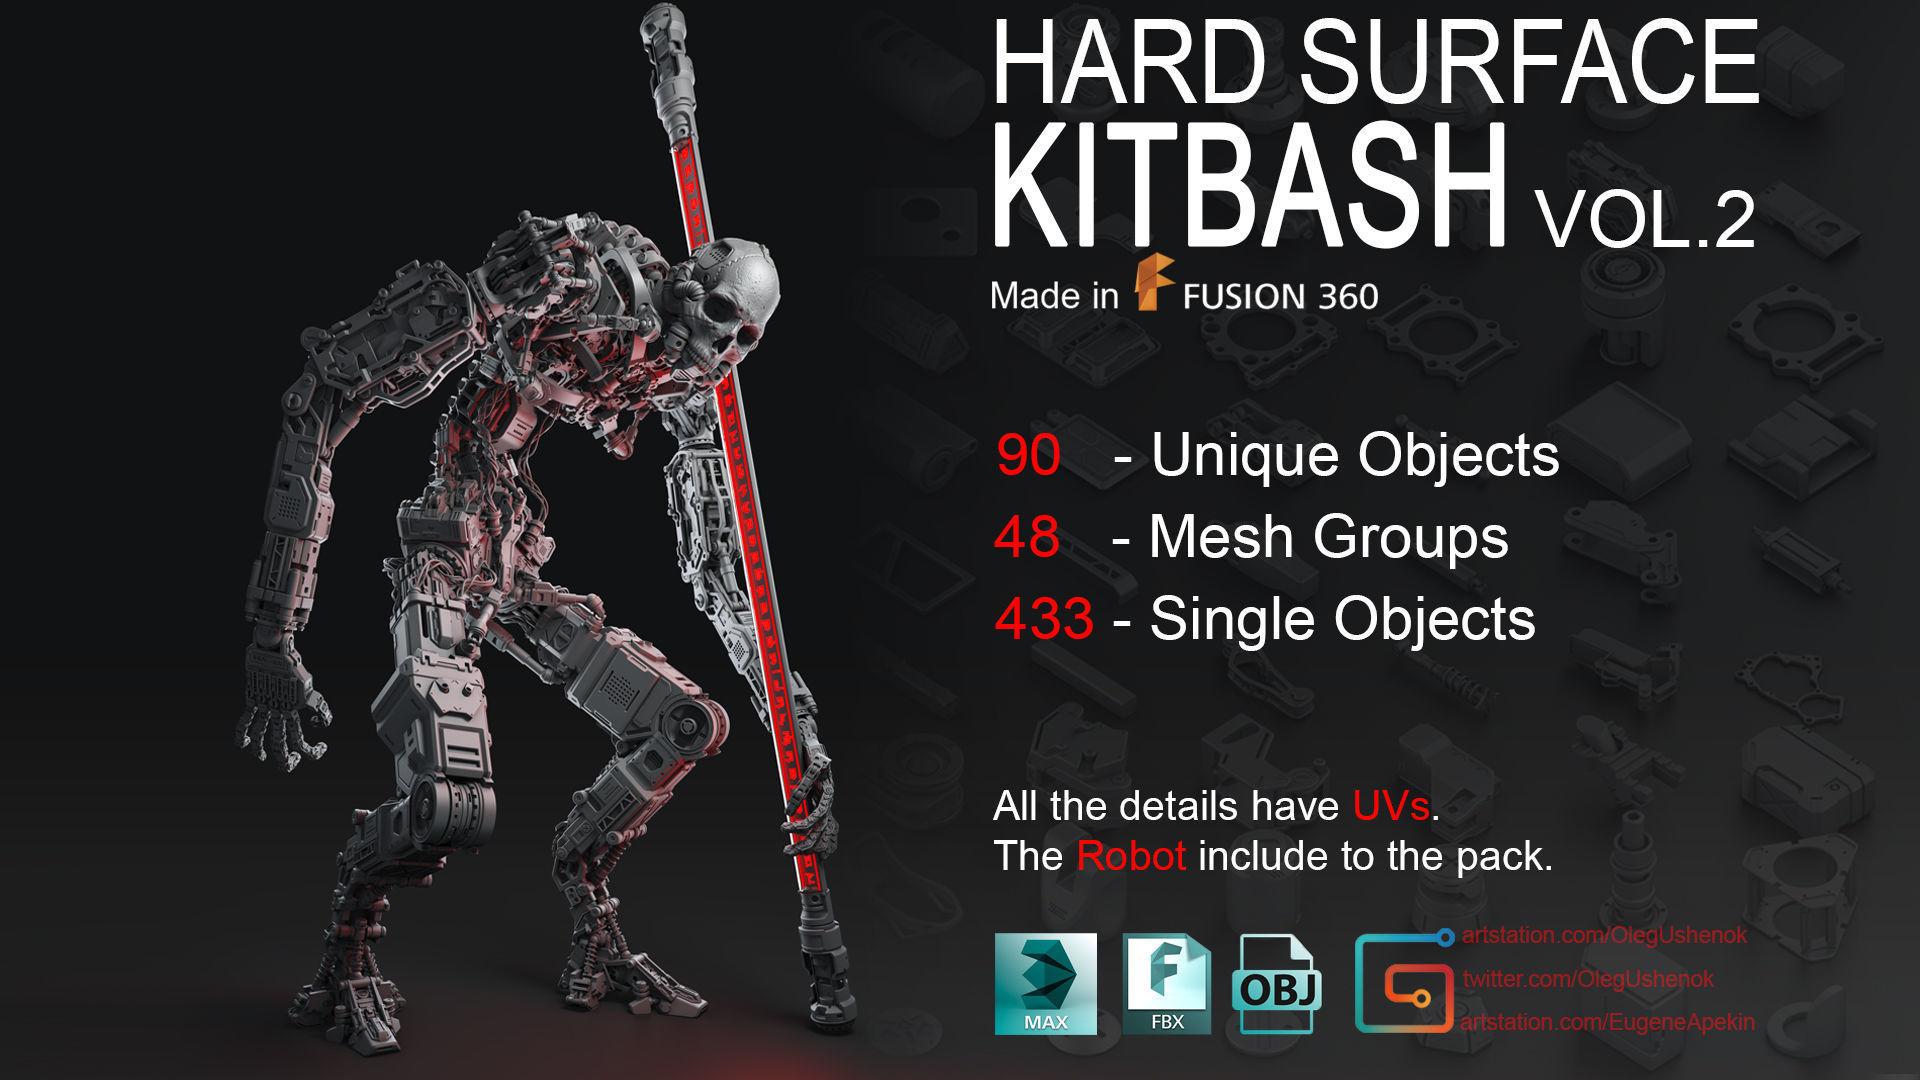 Hard Surface KitBash Volume 2